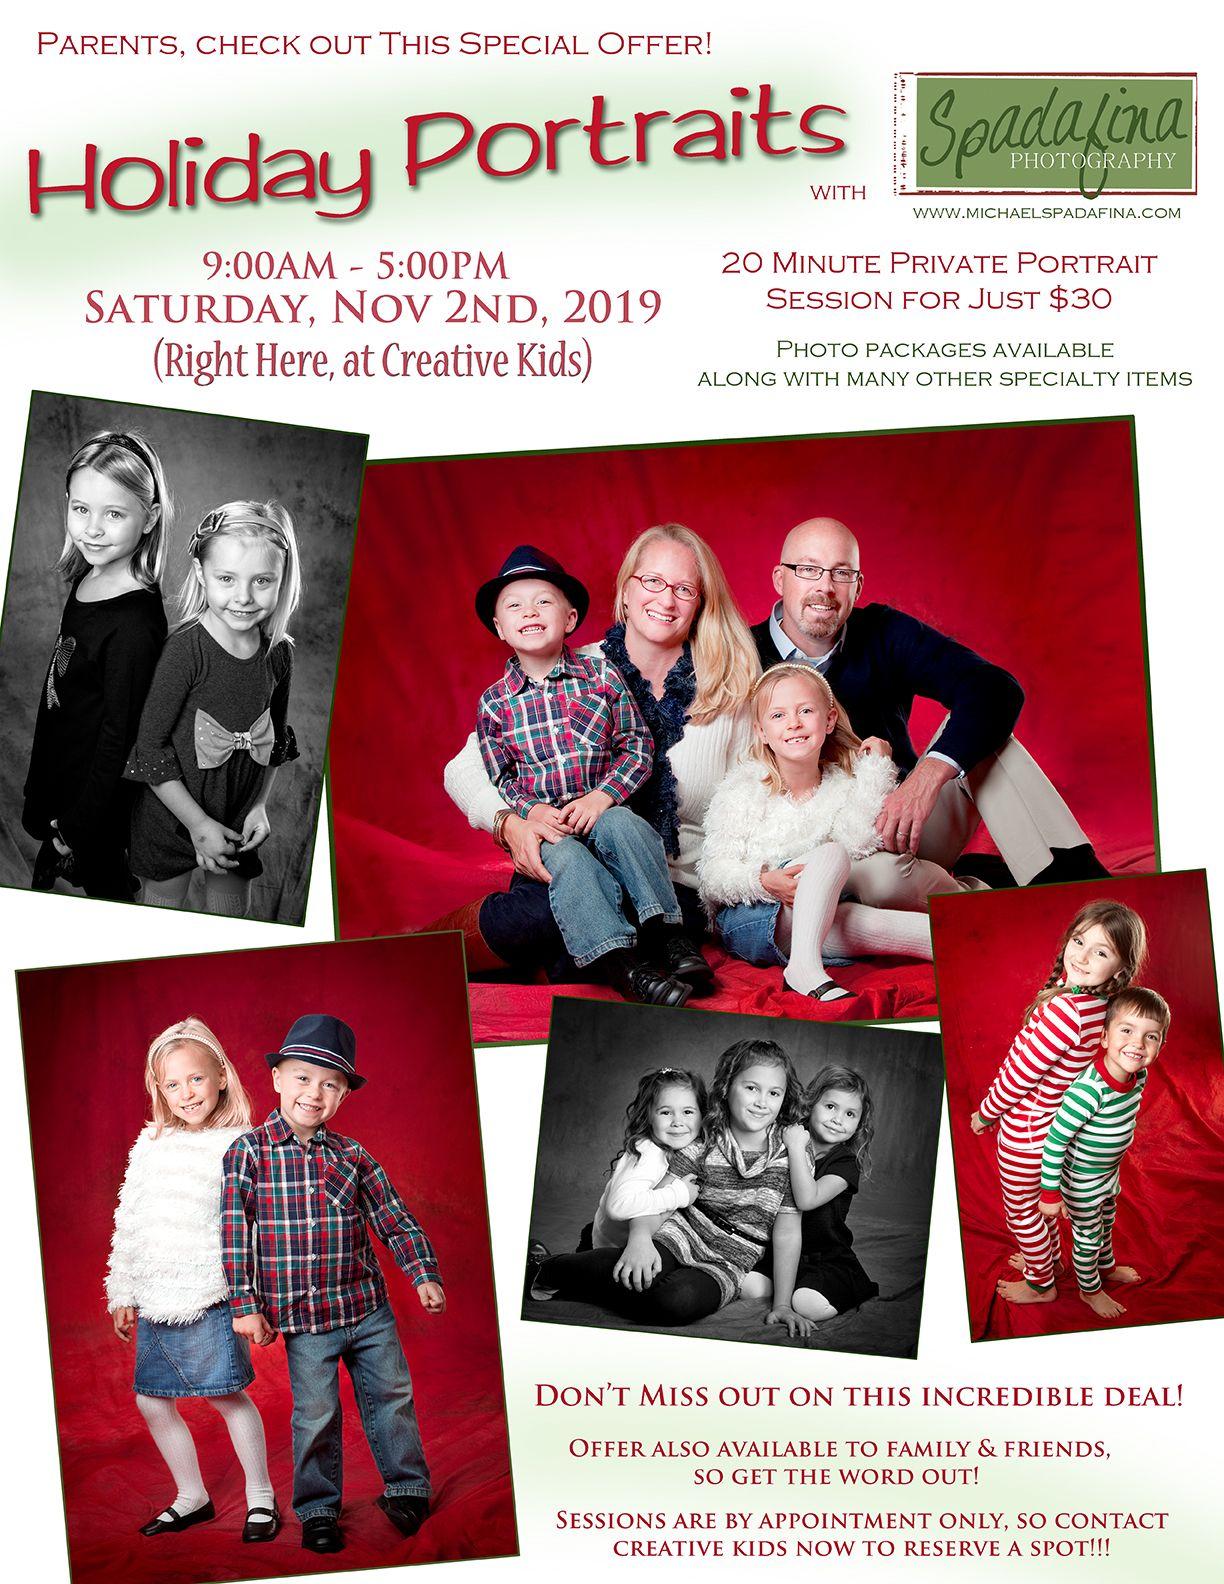 Holiday Portraits Poster 2019.jpg